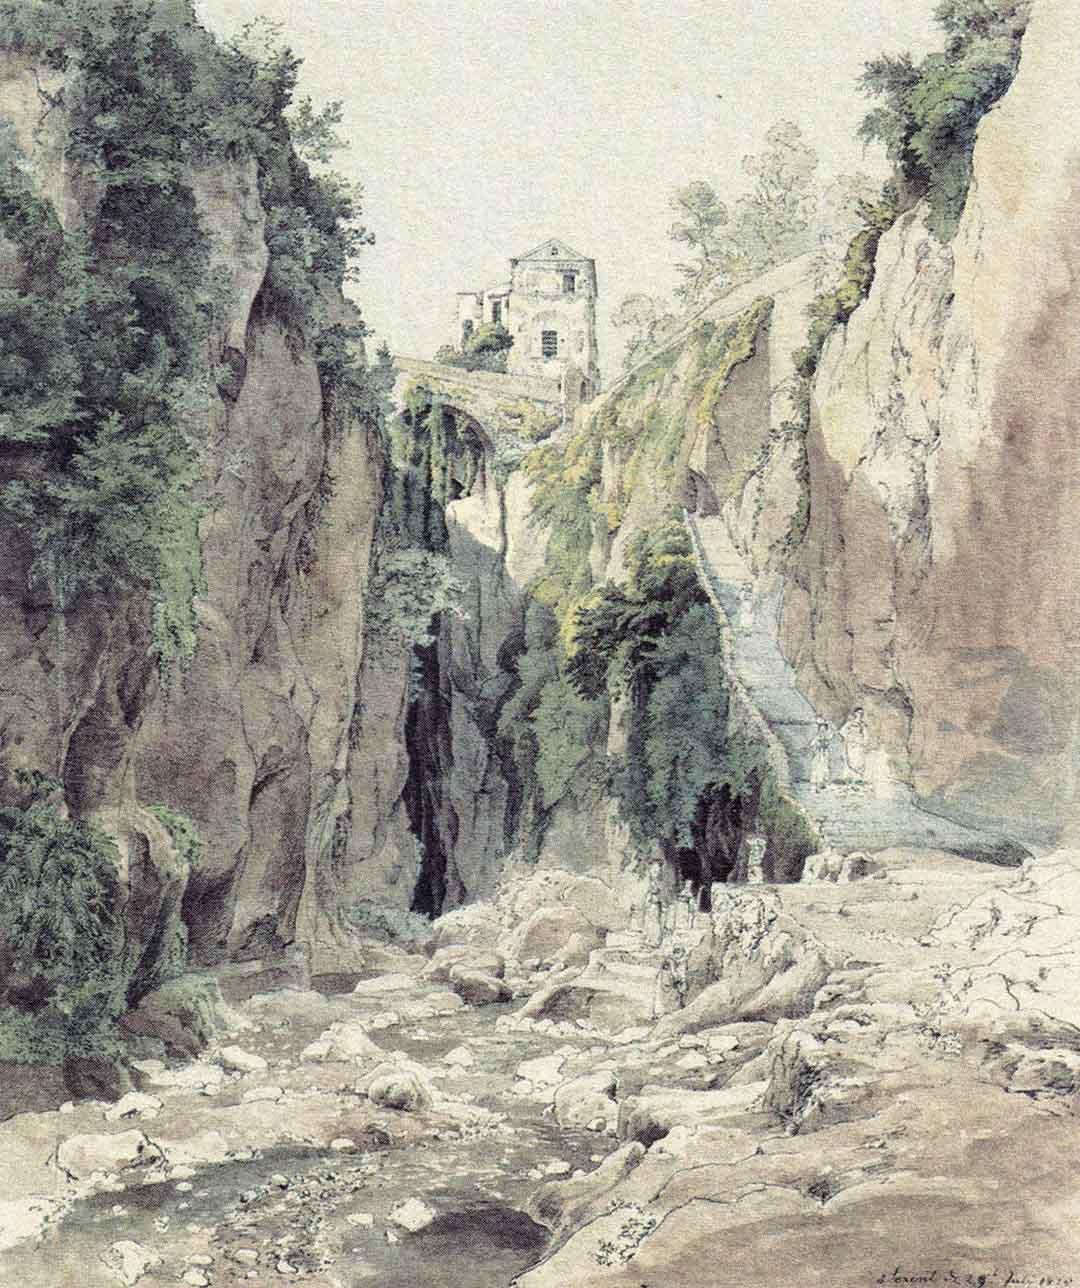 Johann Heinrich SCHILBACH (Barchfeld 1798 – Darmstadt 1851), Una ripida gradinata a Sorrento, 1825